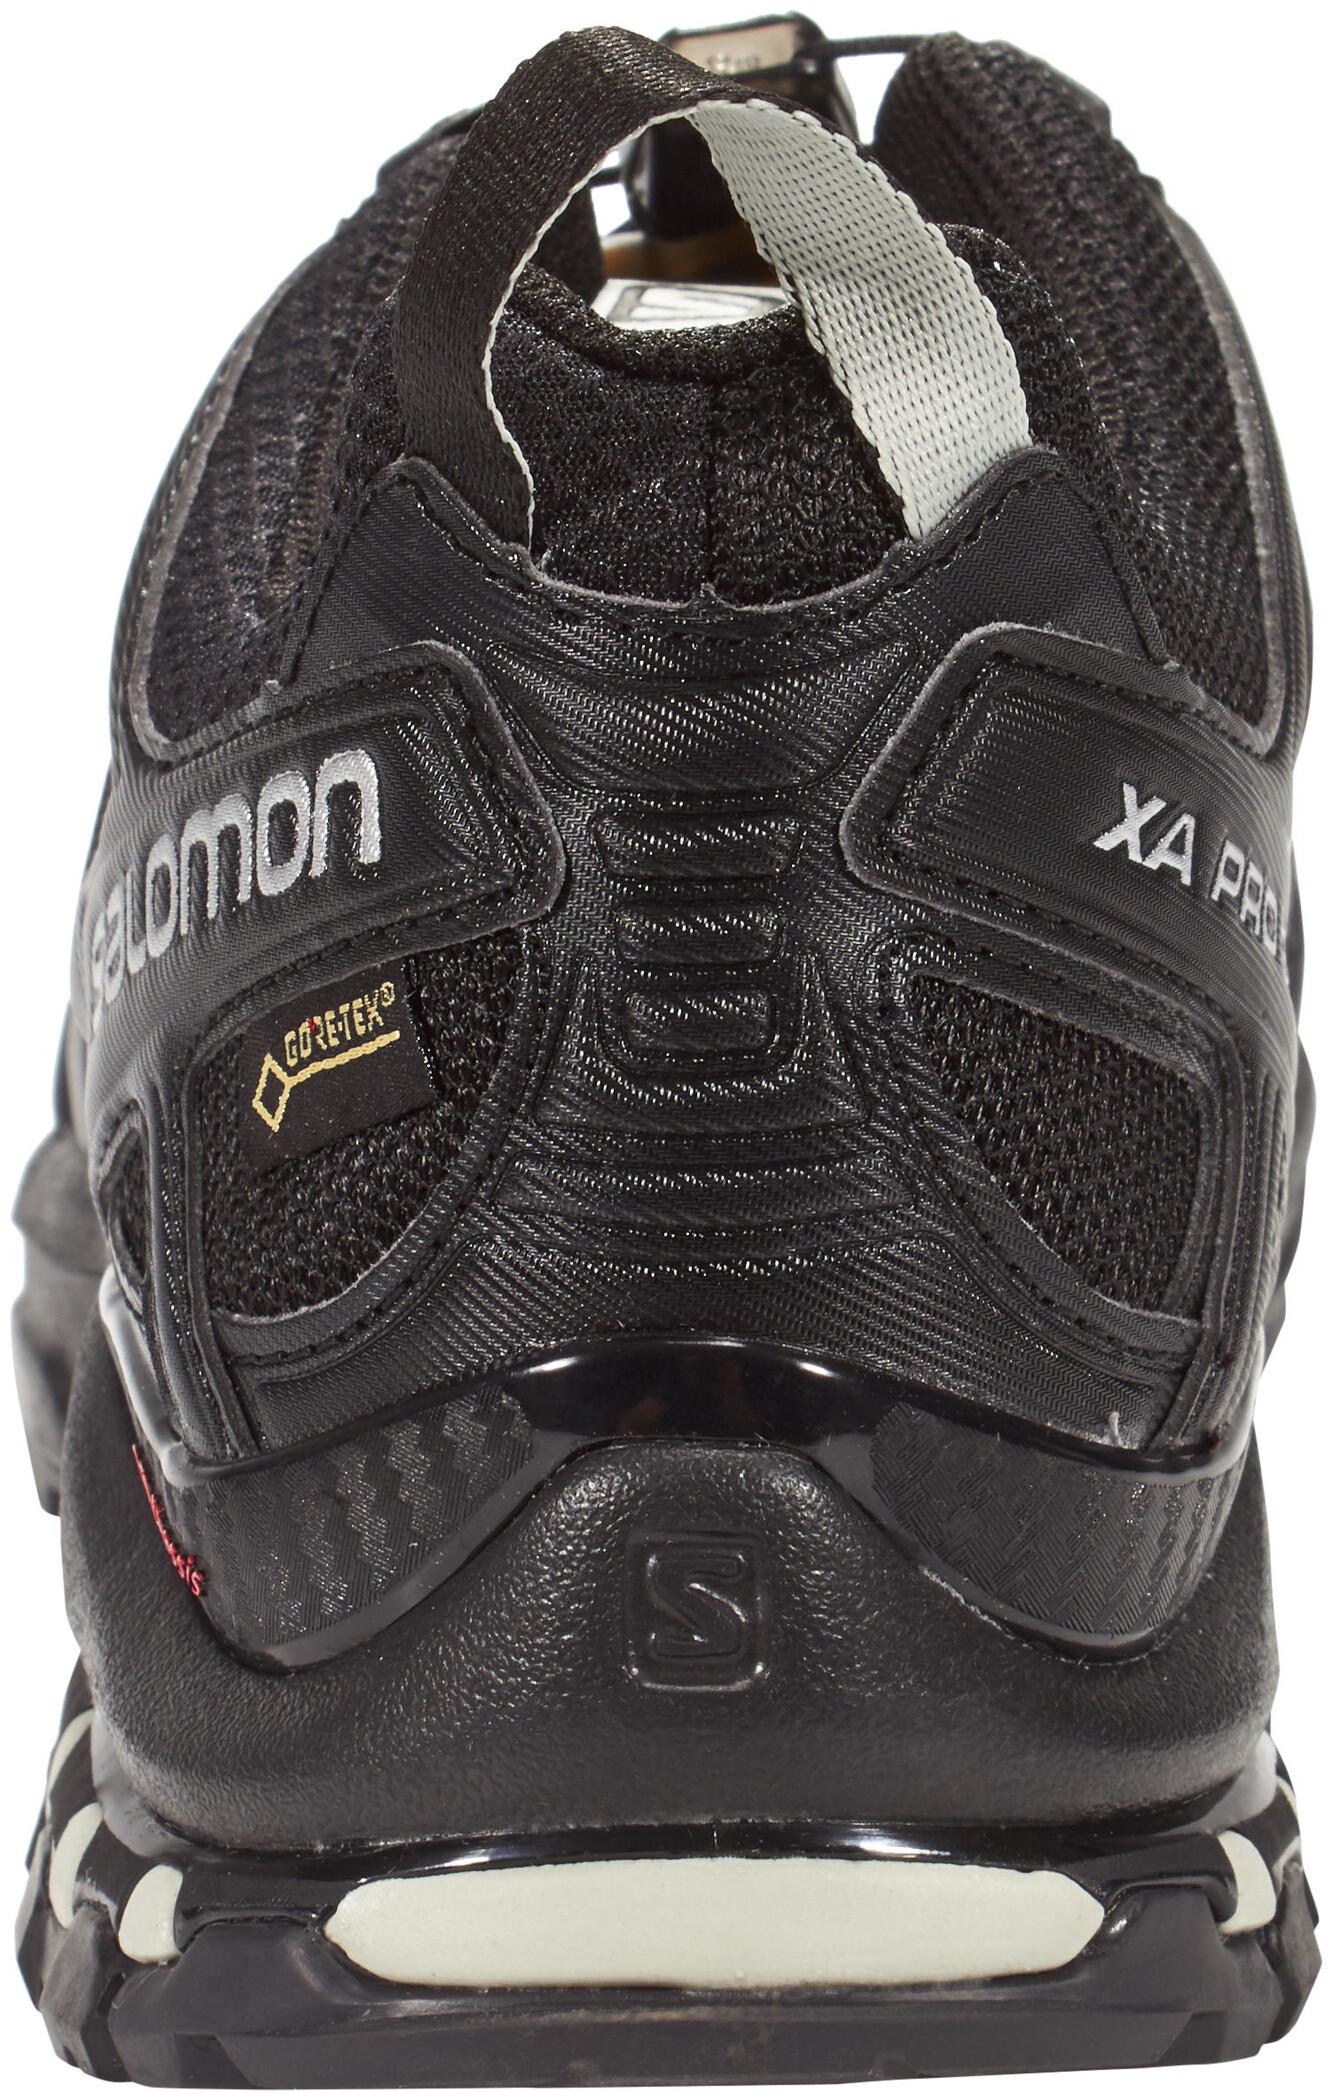 Salomon XA Pro 3D GTX Trailrunning Schuhe Damen blackblackmineral grey